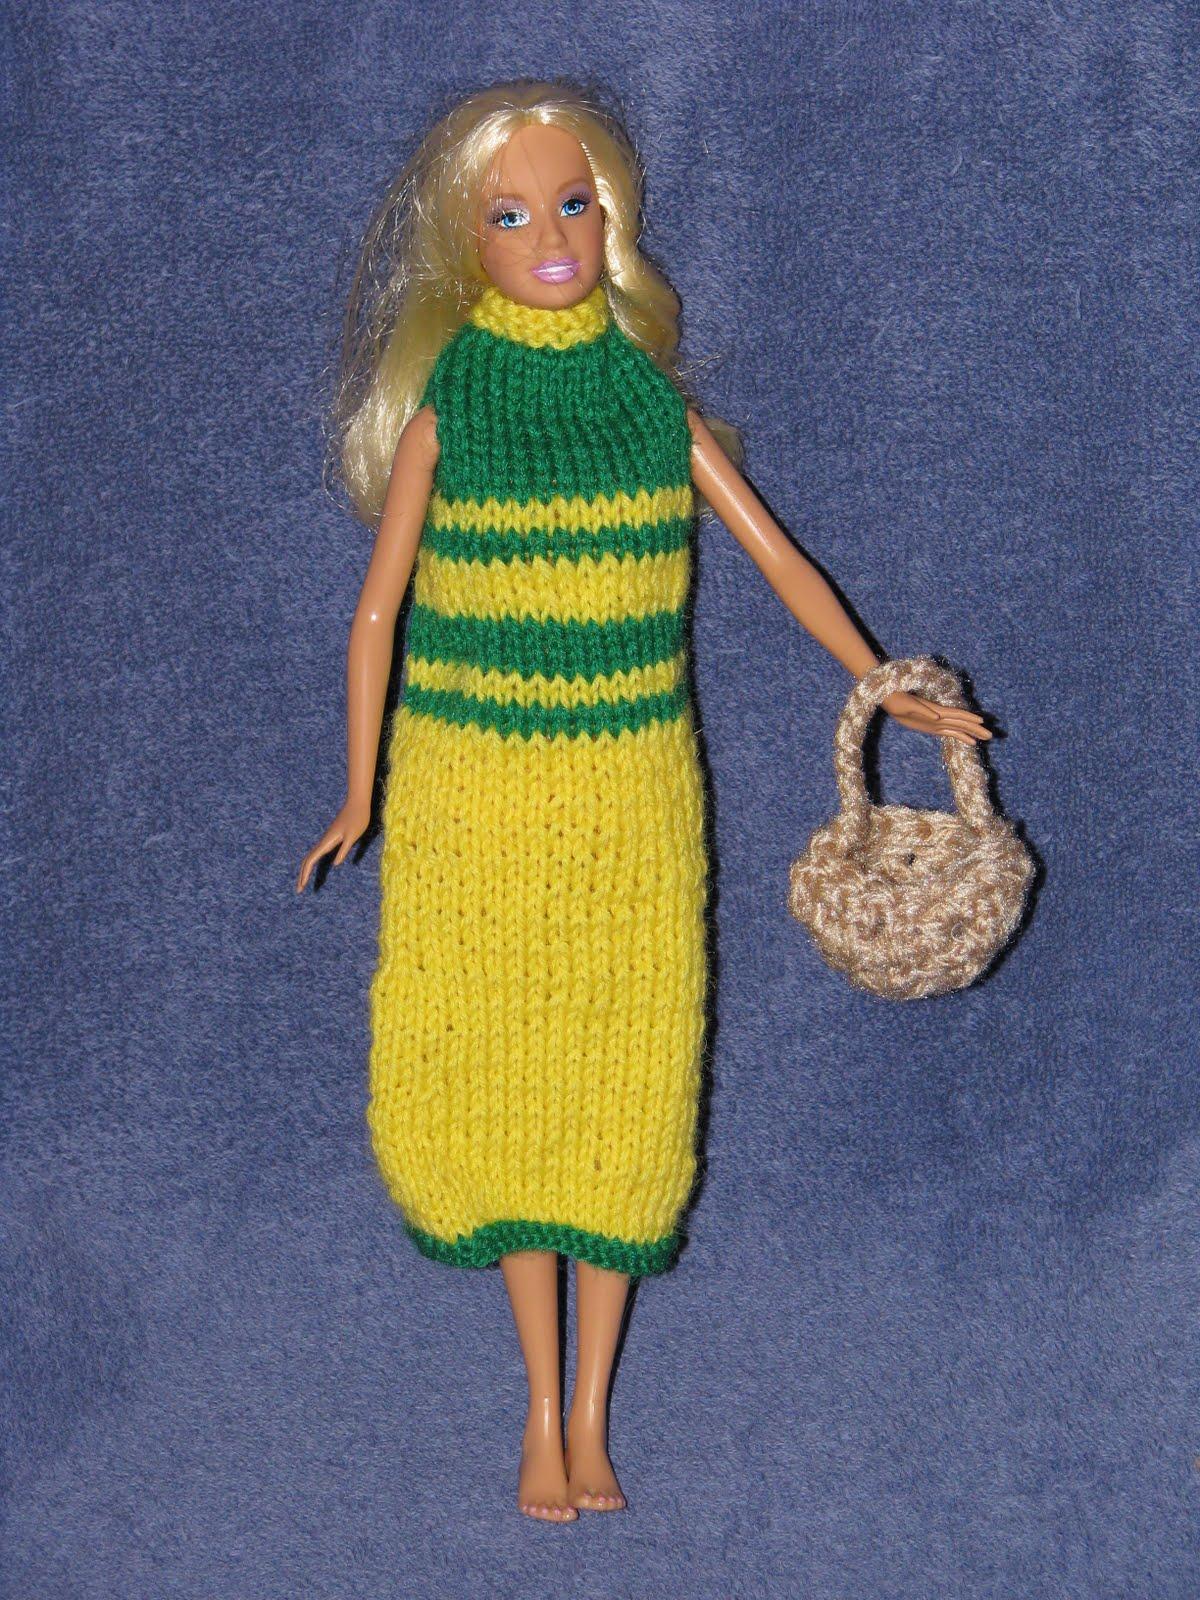 Free Crochet Baby Bonnet Patterns - Crocheting Baby Bonnets